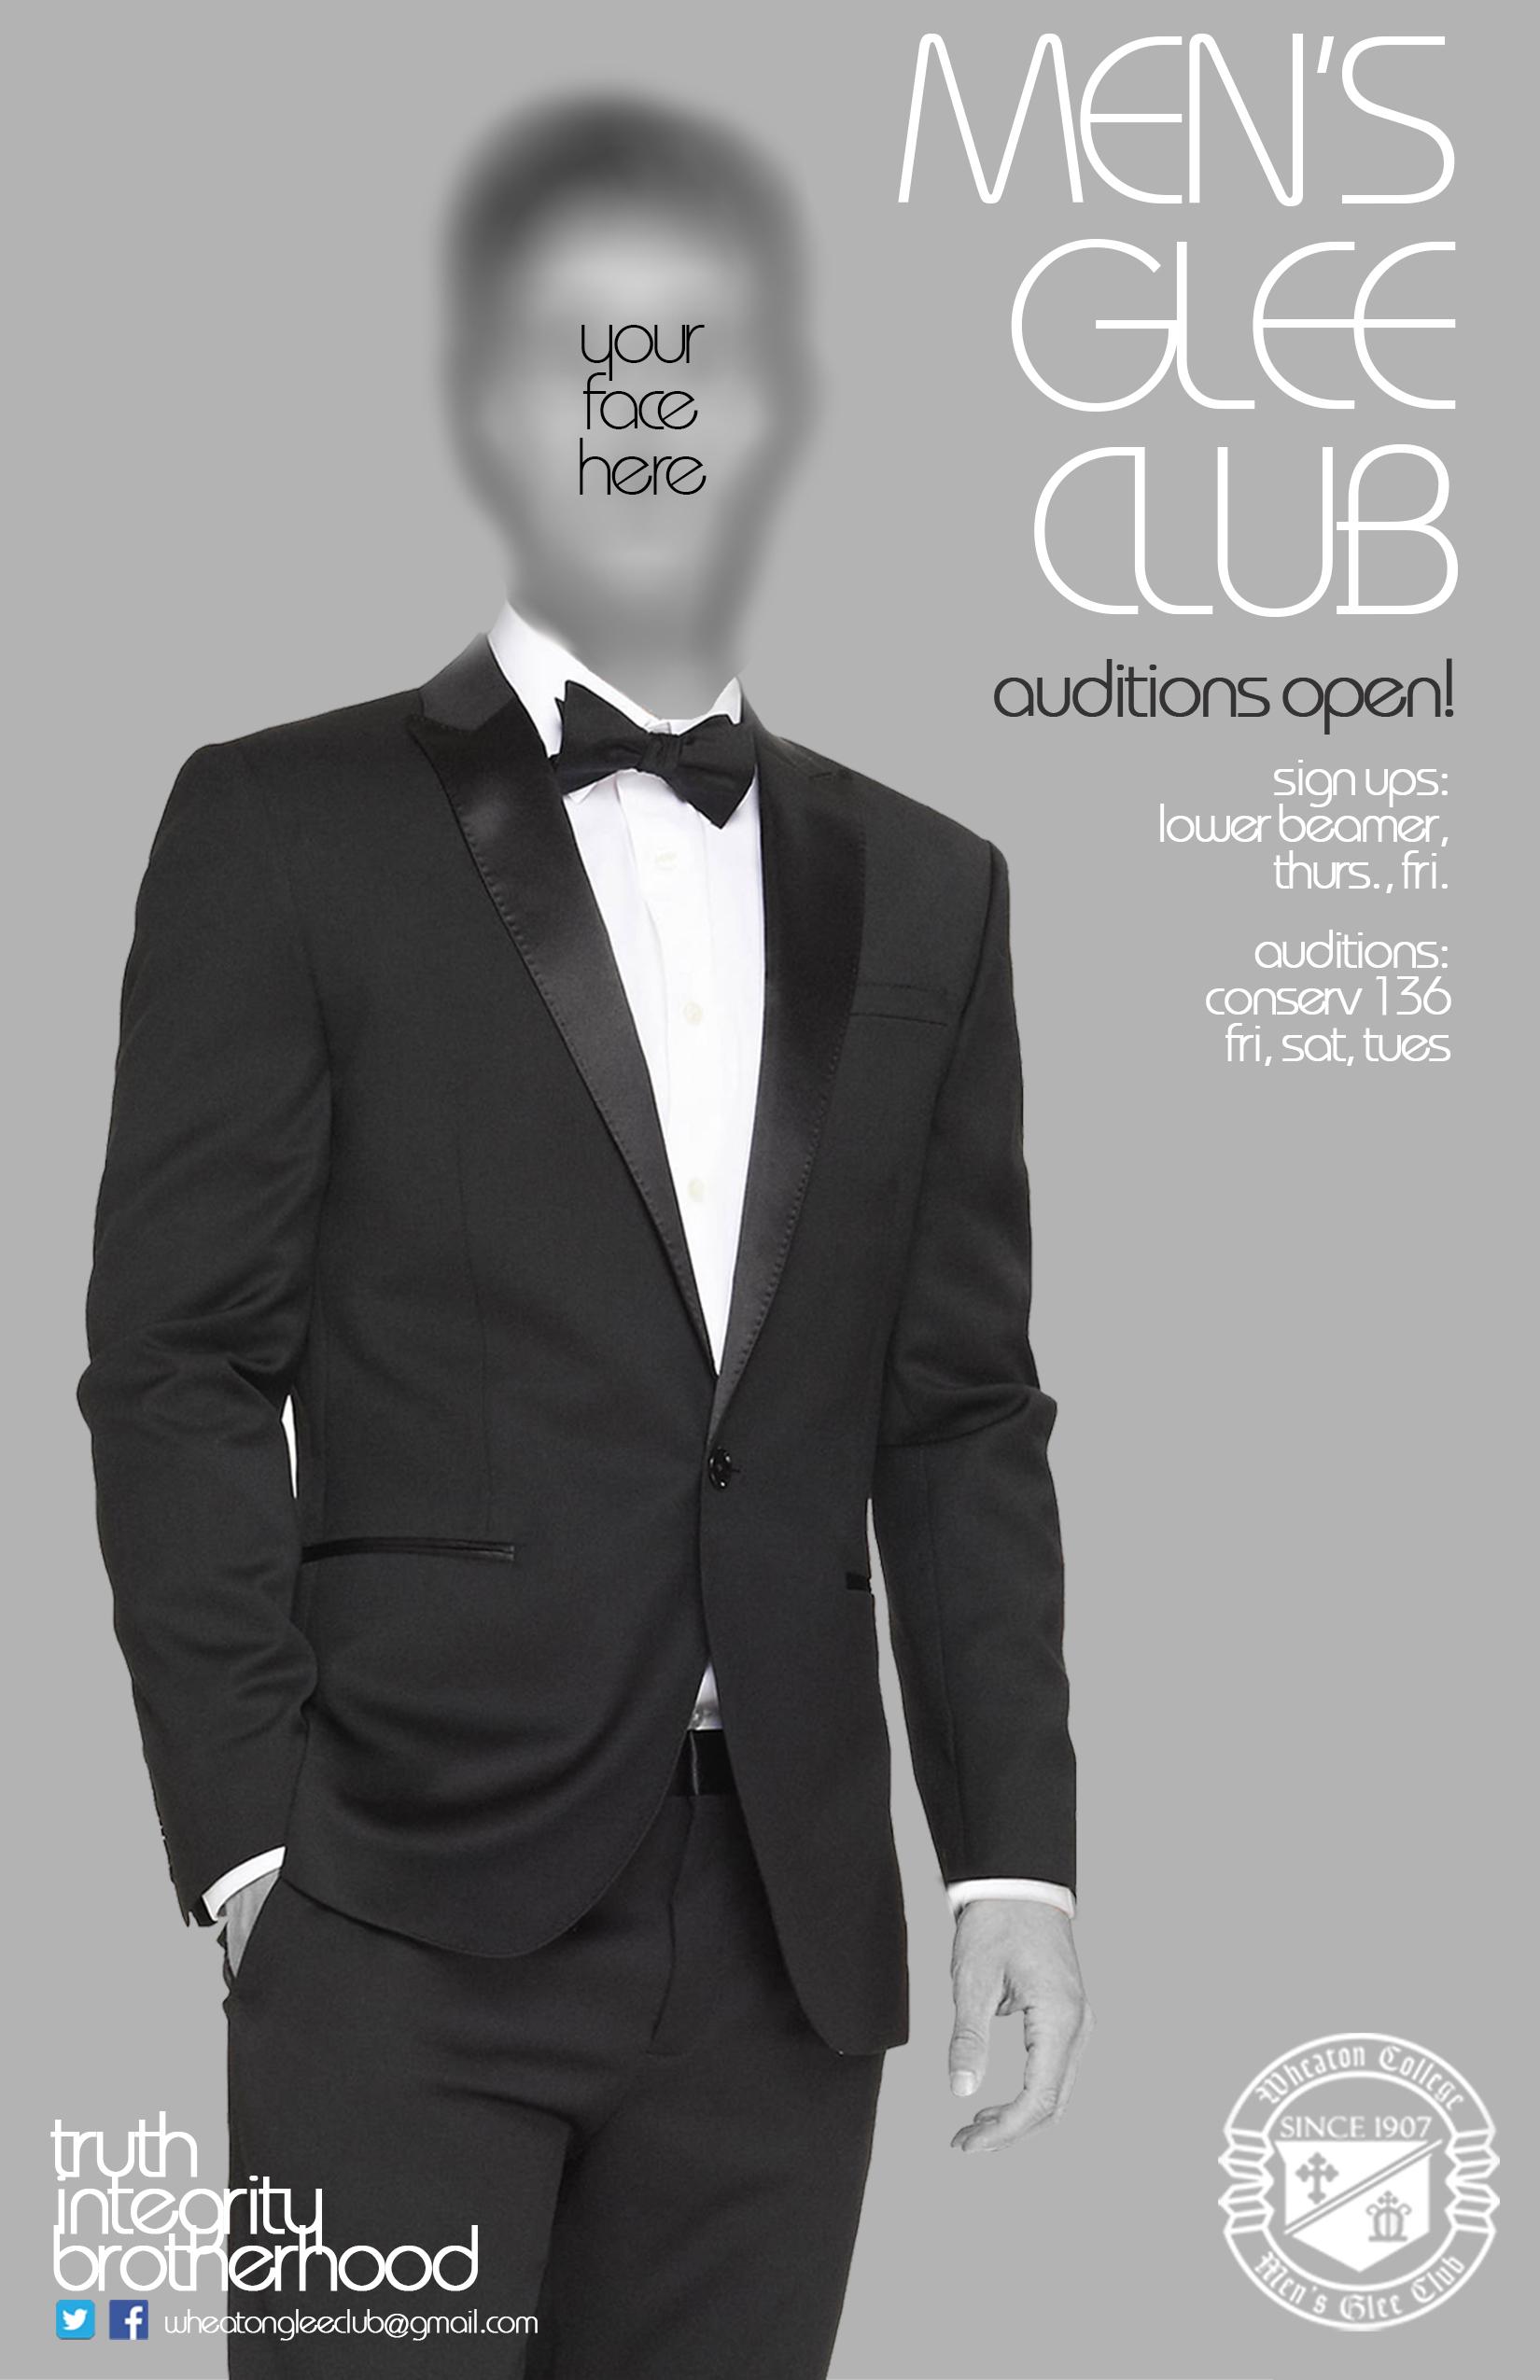 Men's Glee Club Poster